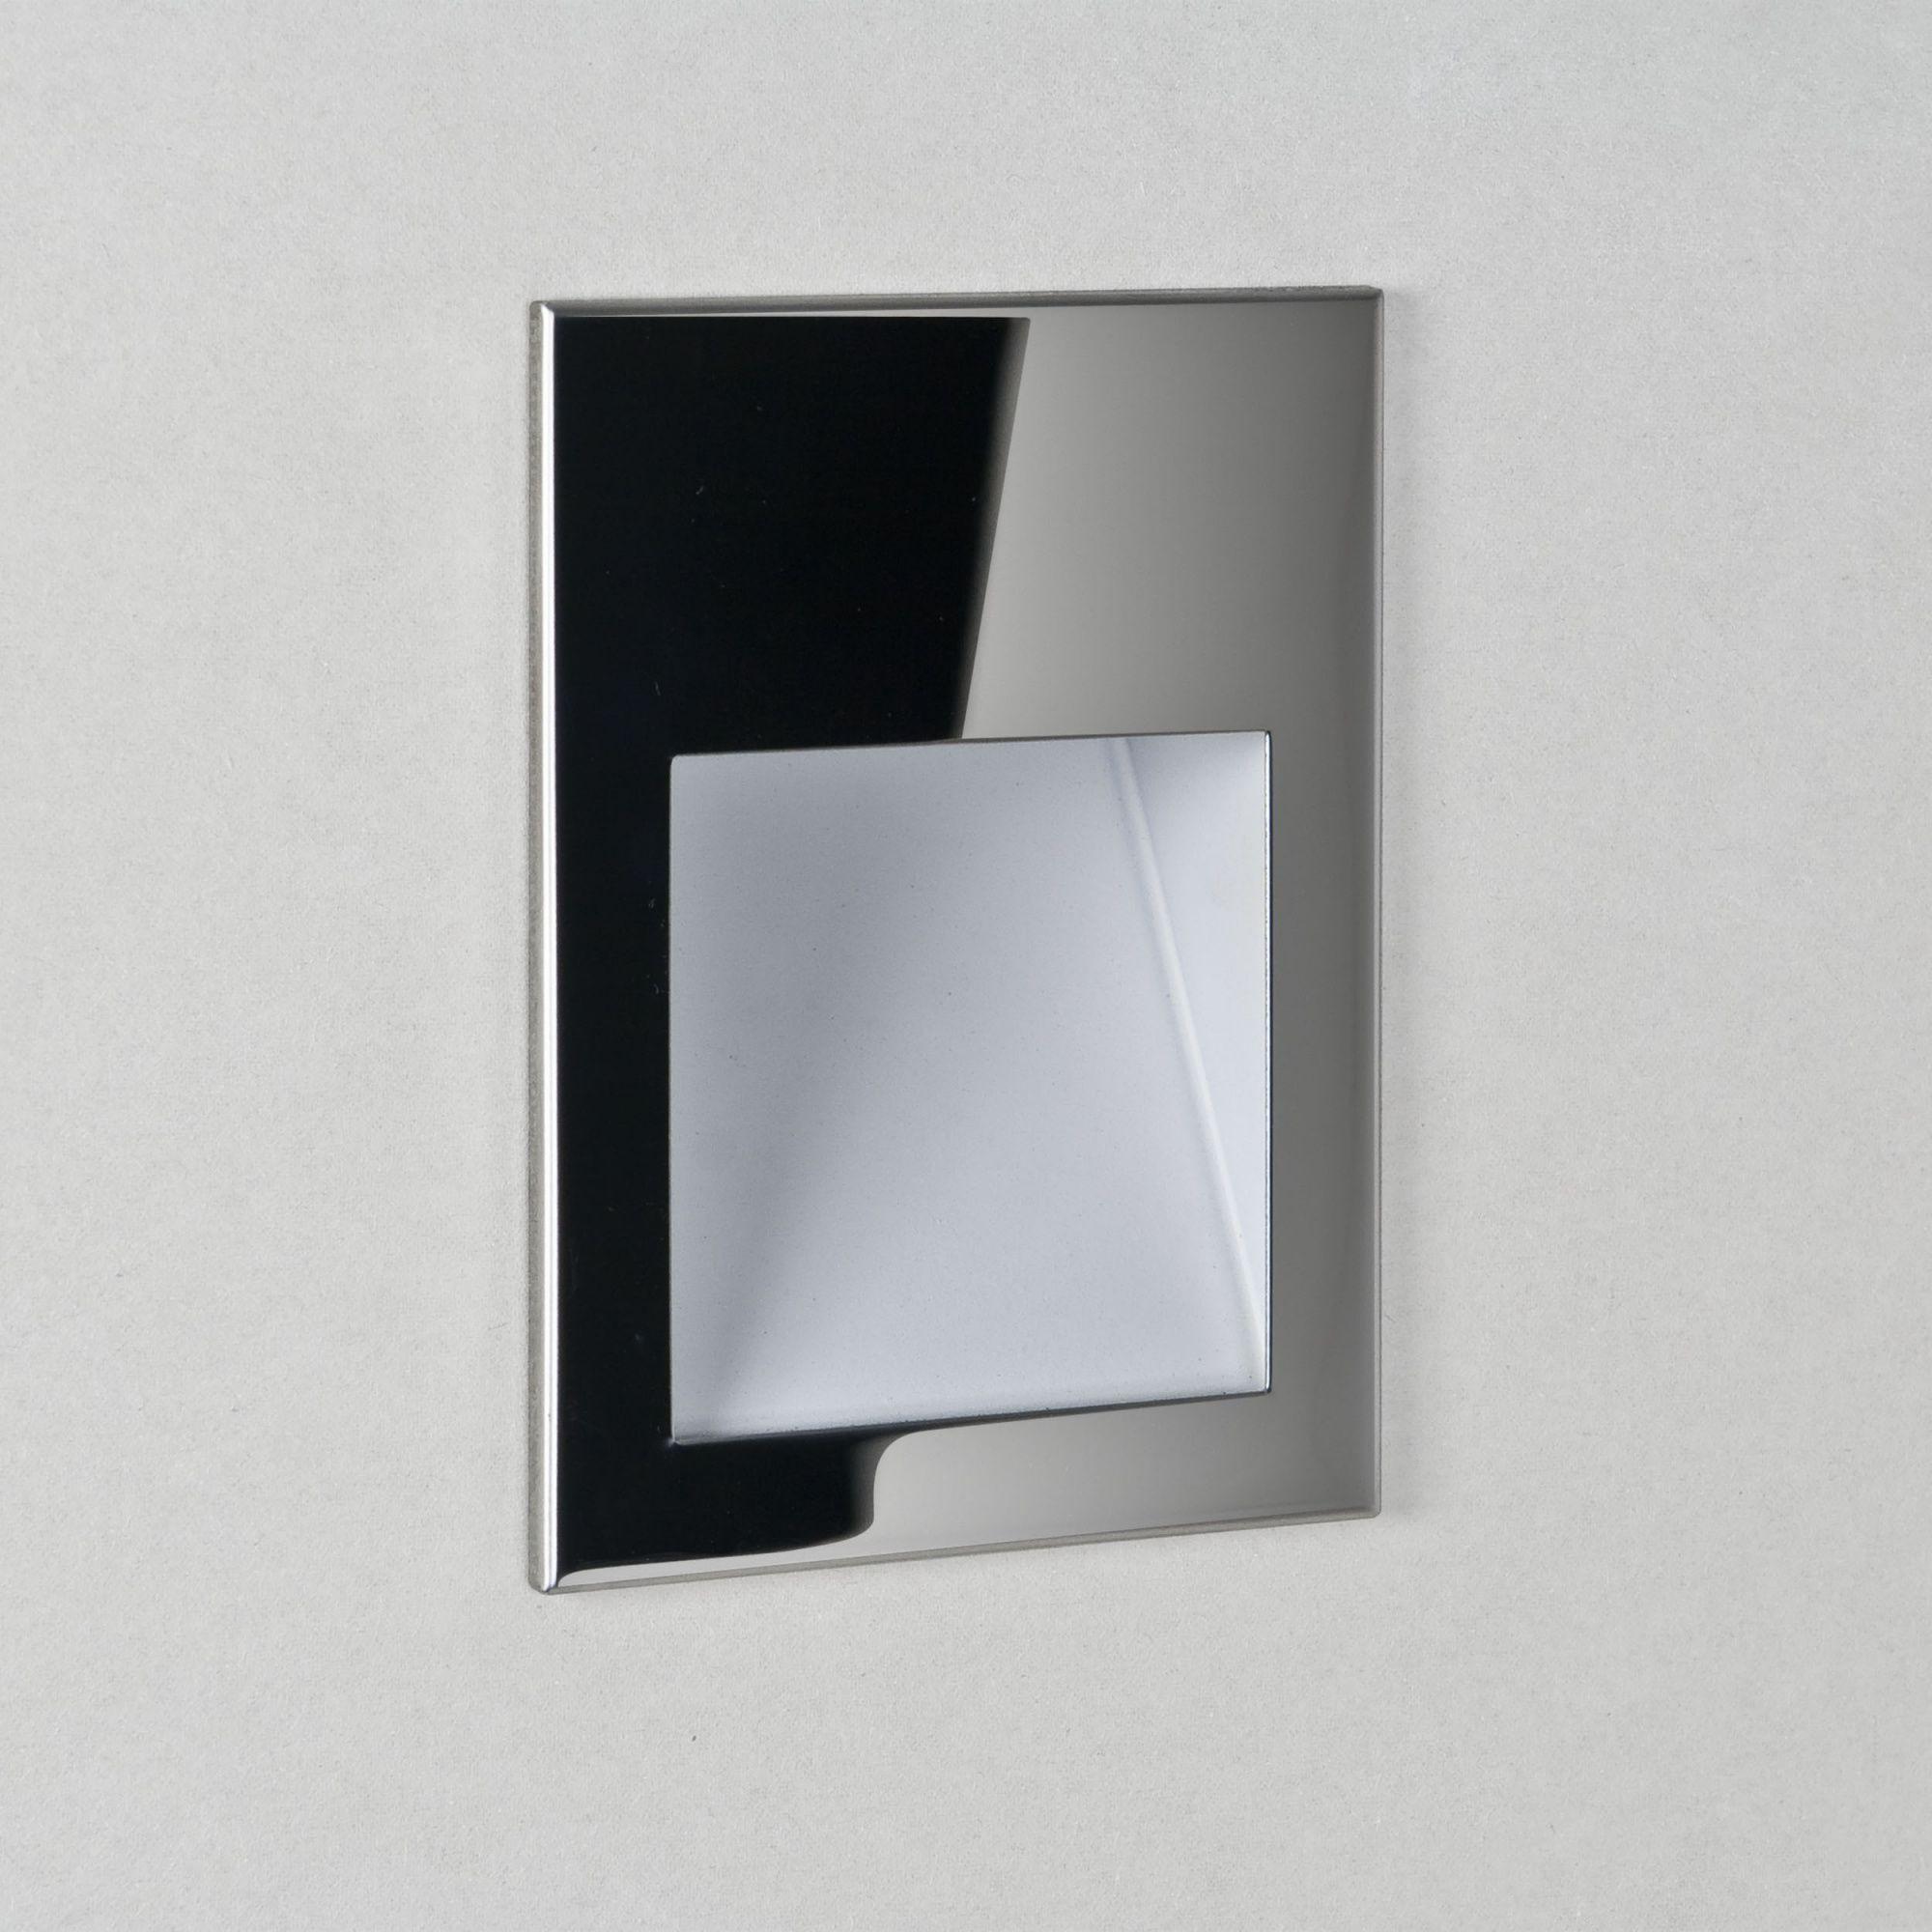 Lampa schodowa Borgo 54 LED 7485 Astro Lighting